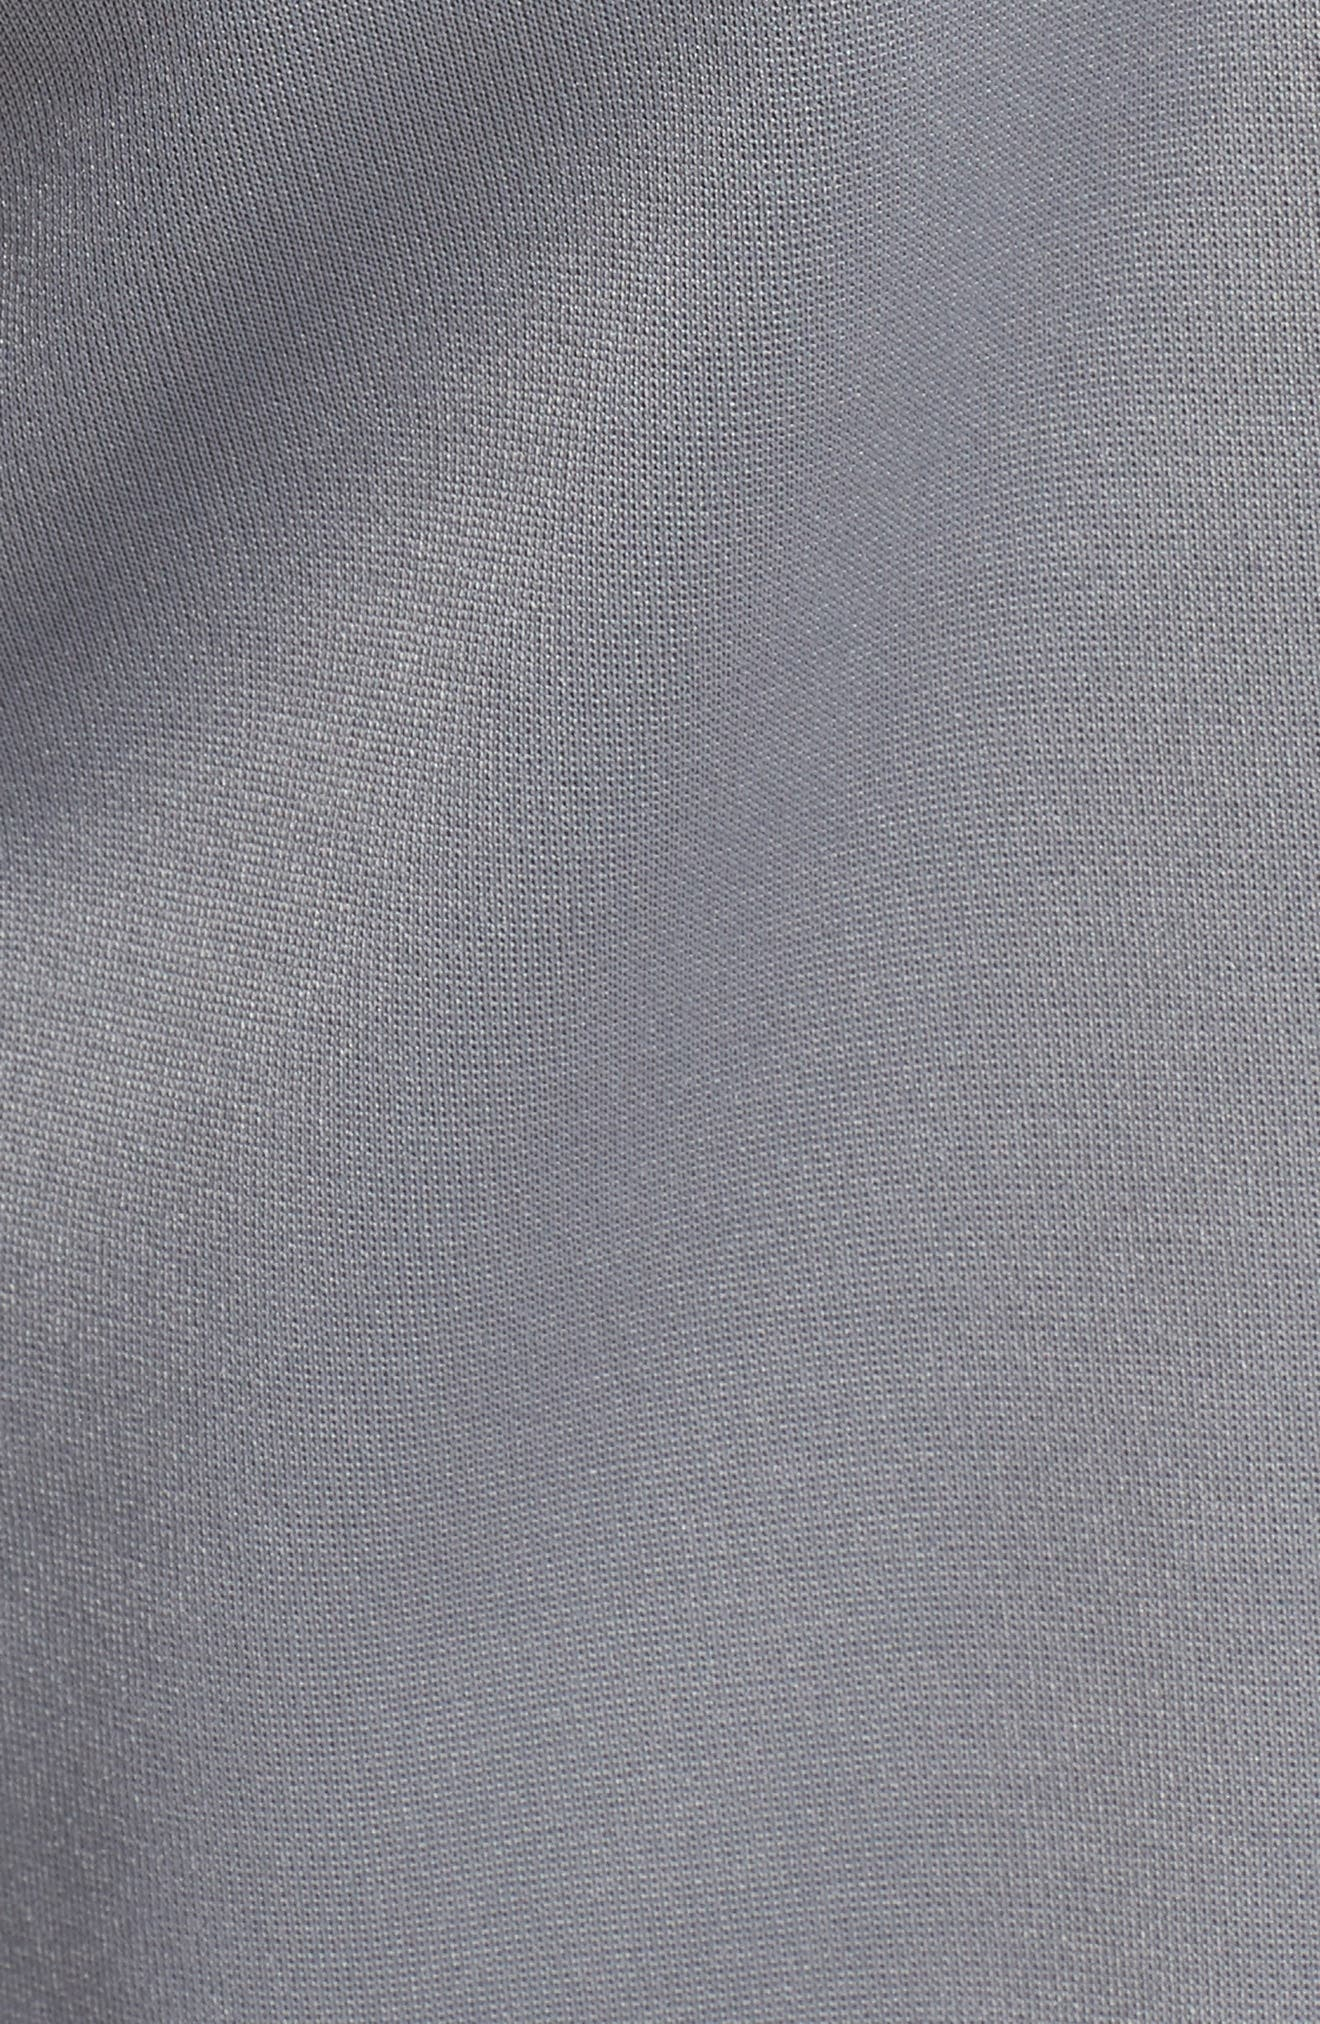 ID Tearaway Track Pants,                             Alternate thumbnail 4, color,                             Black